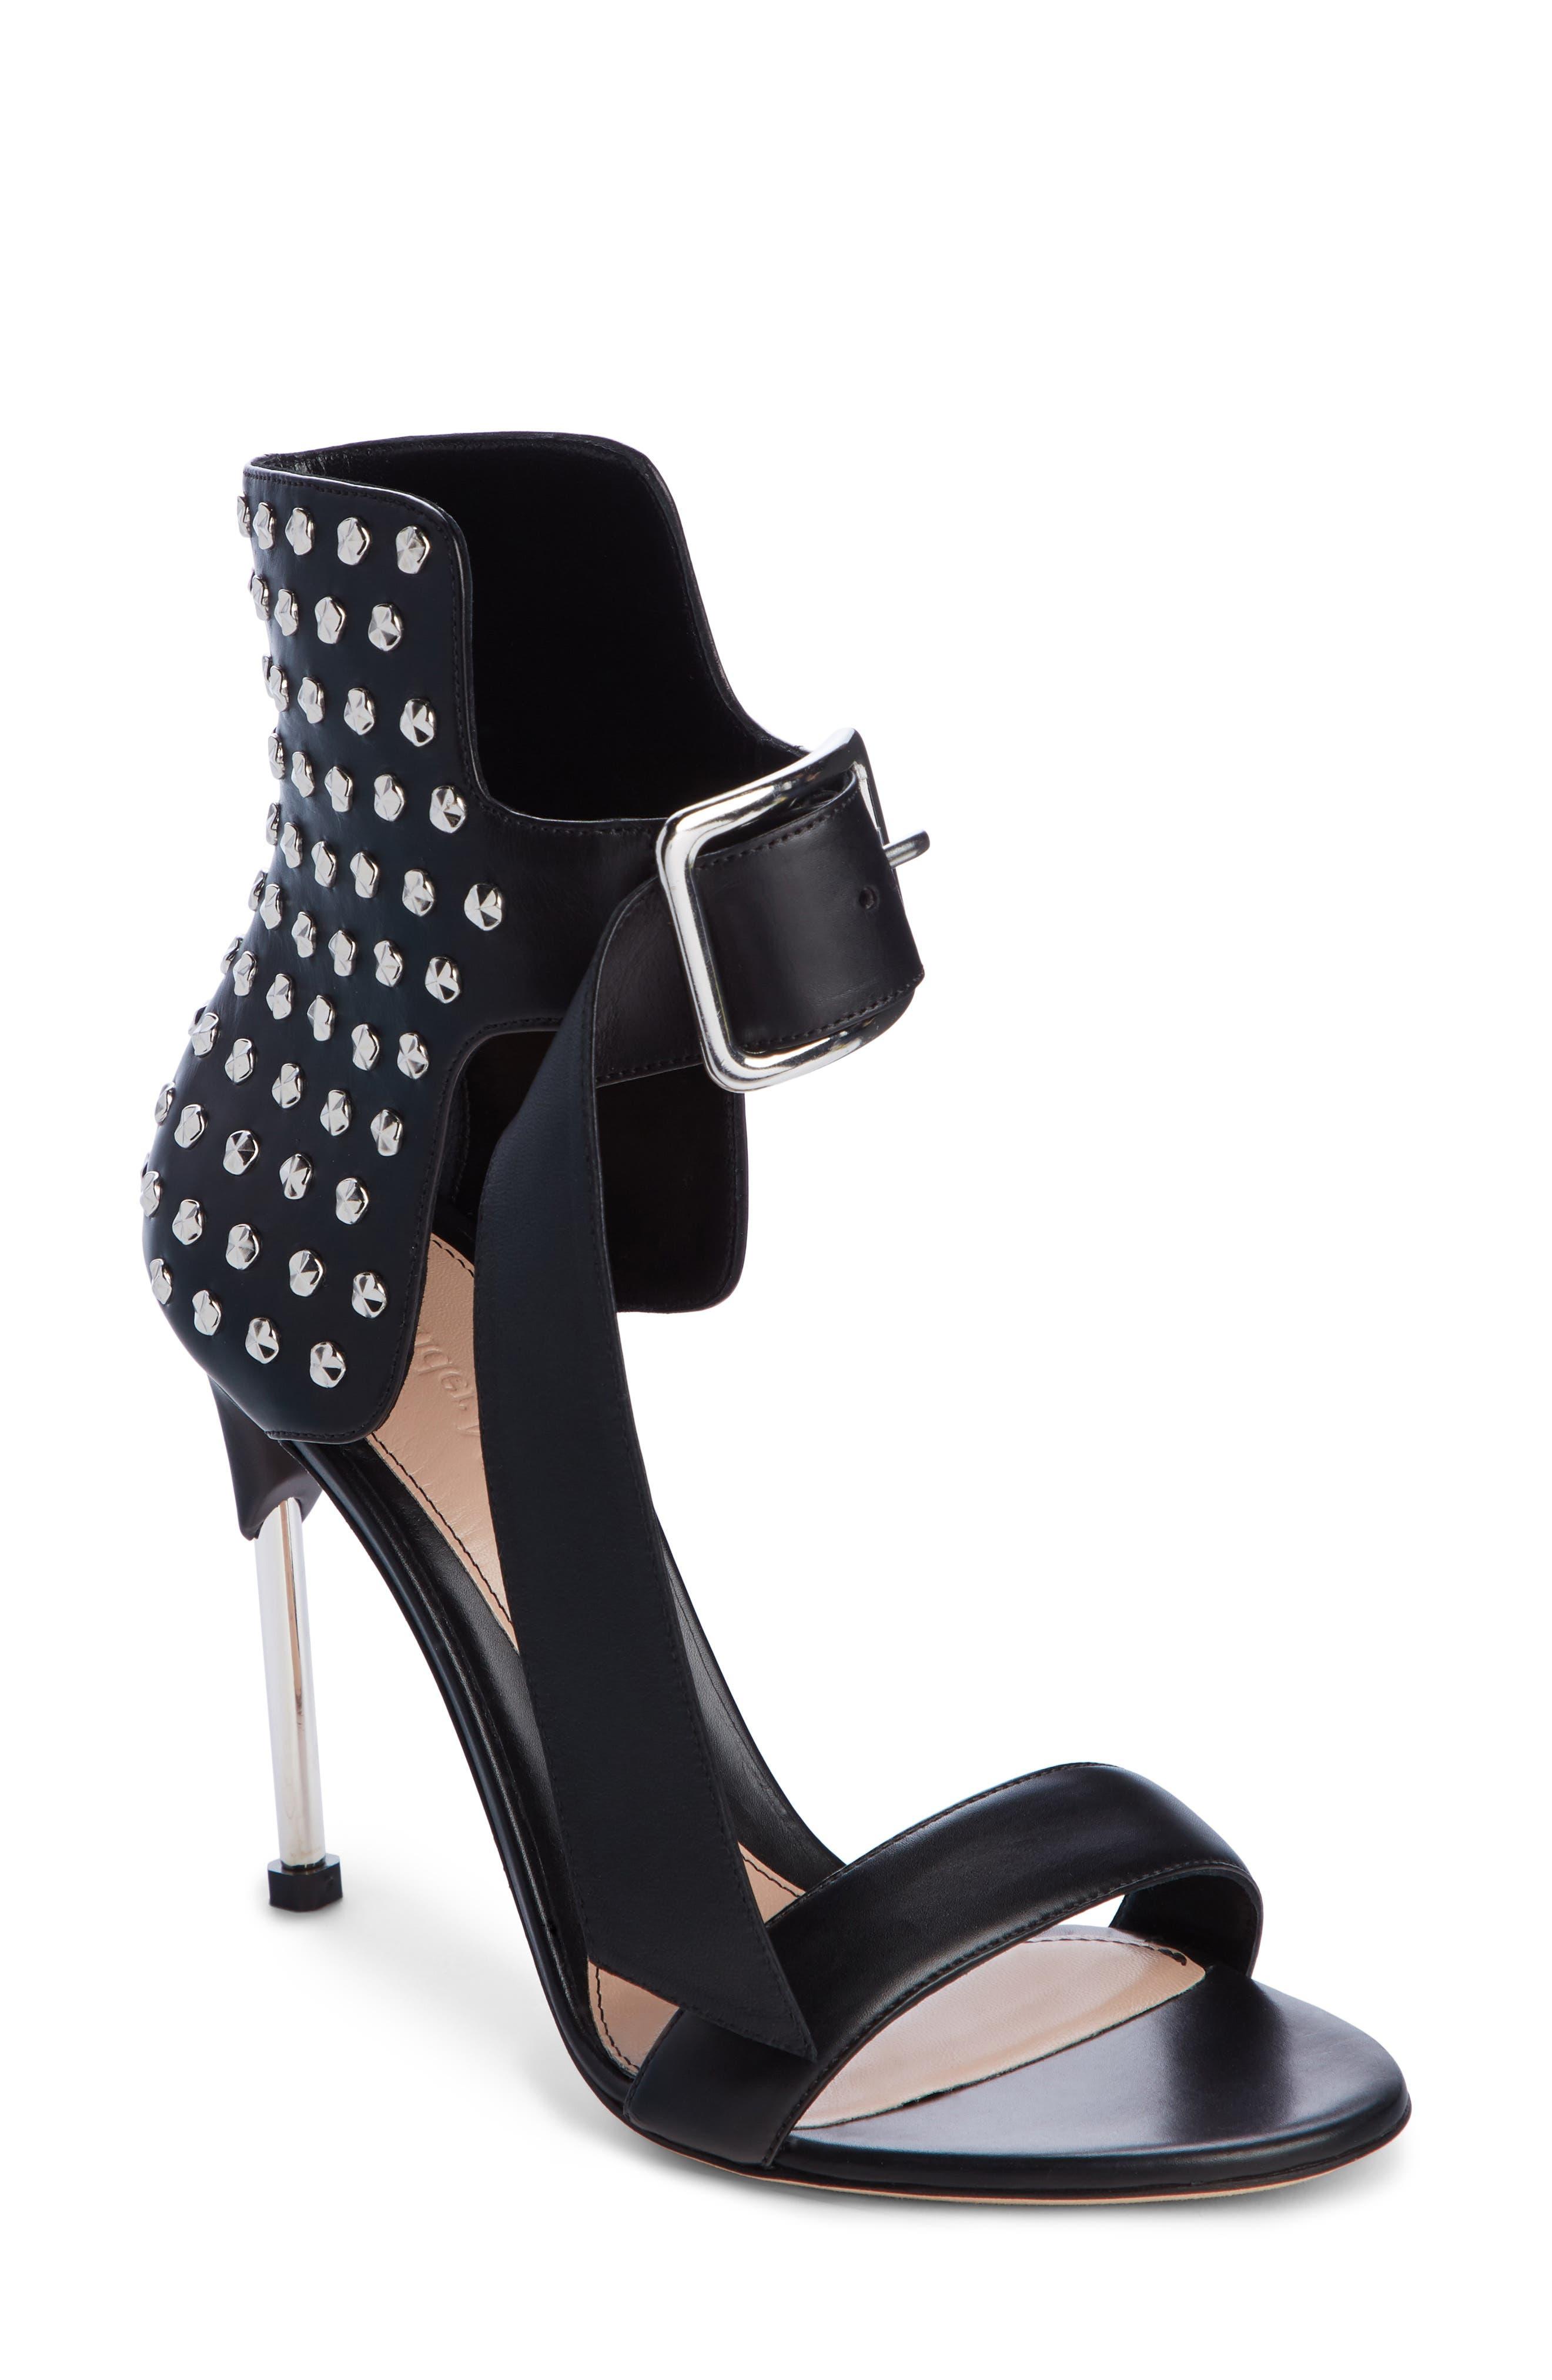 ALEXANDER MCQUEEN Studded Ankle Strap Sandal, Main, color, BLACK